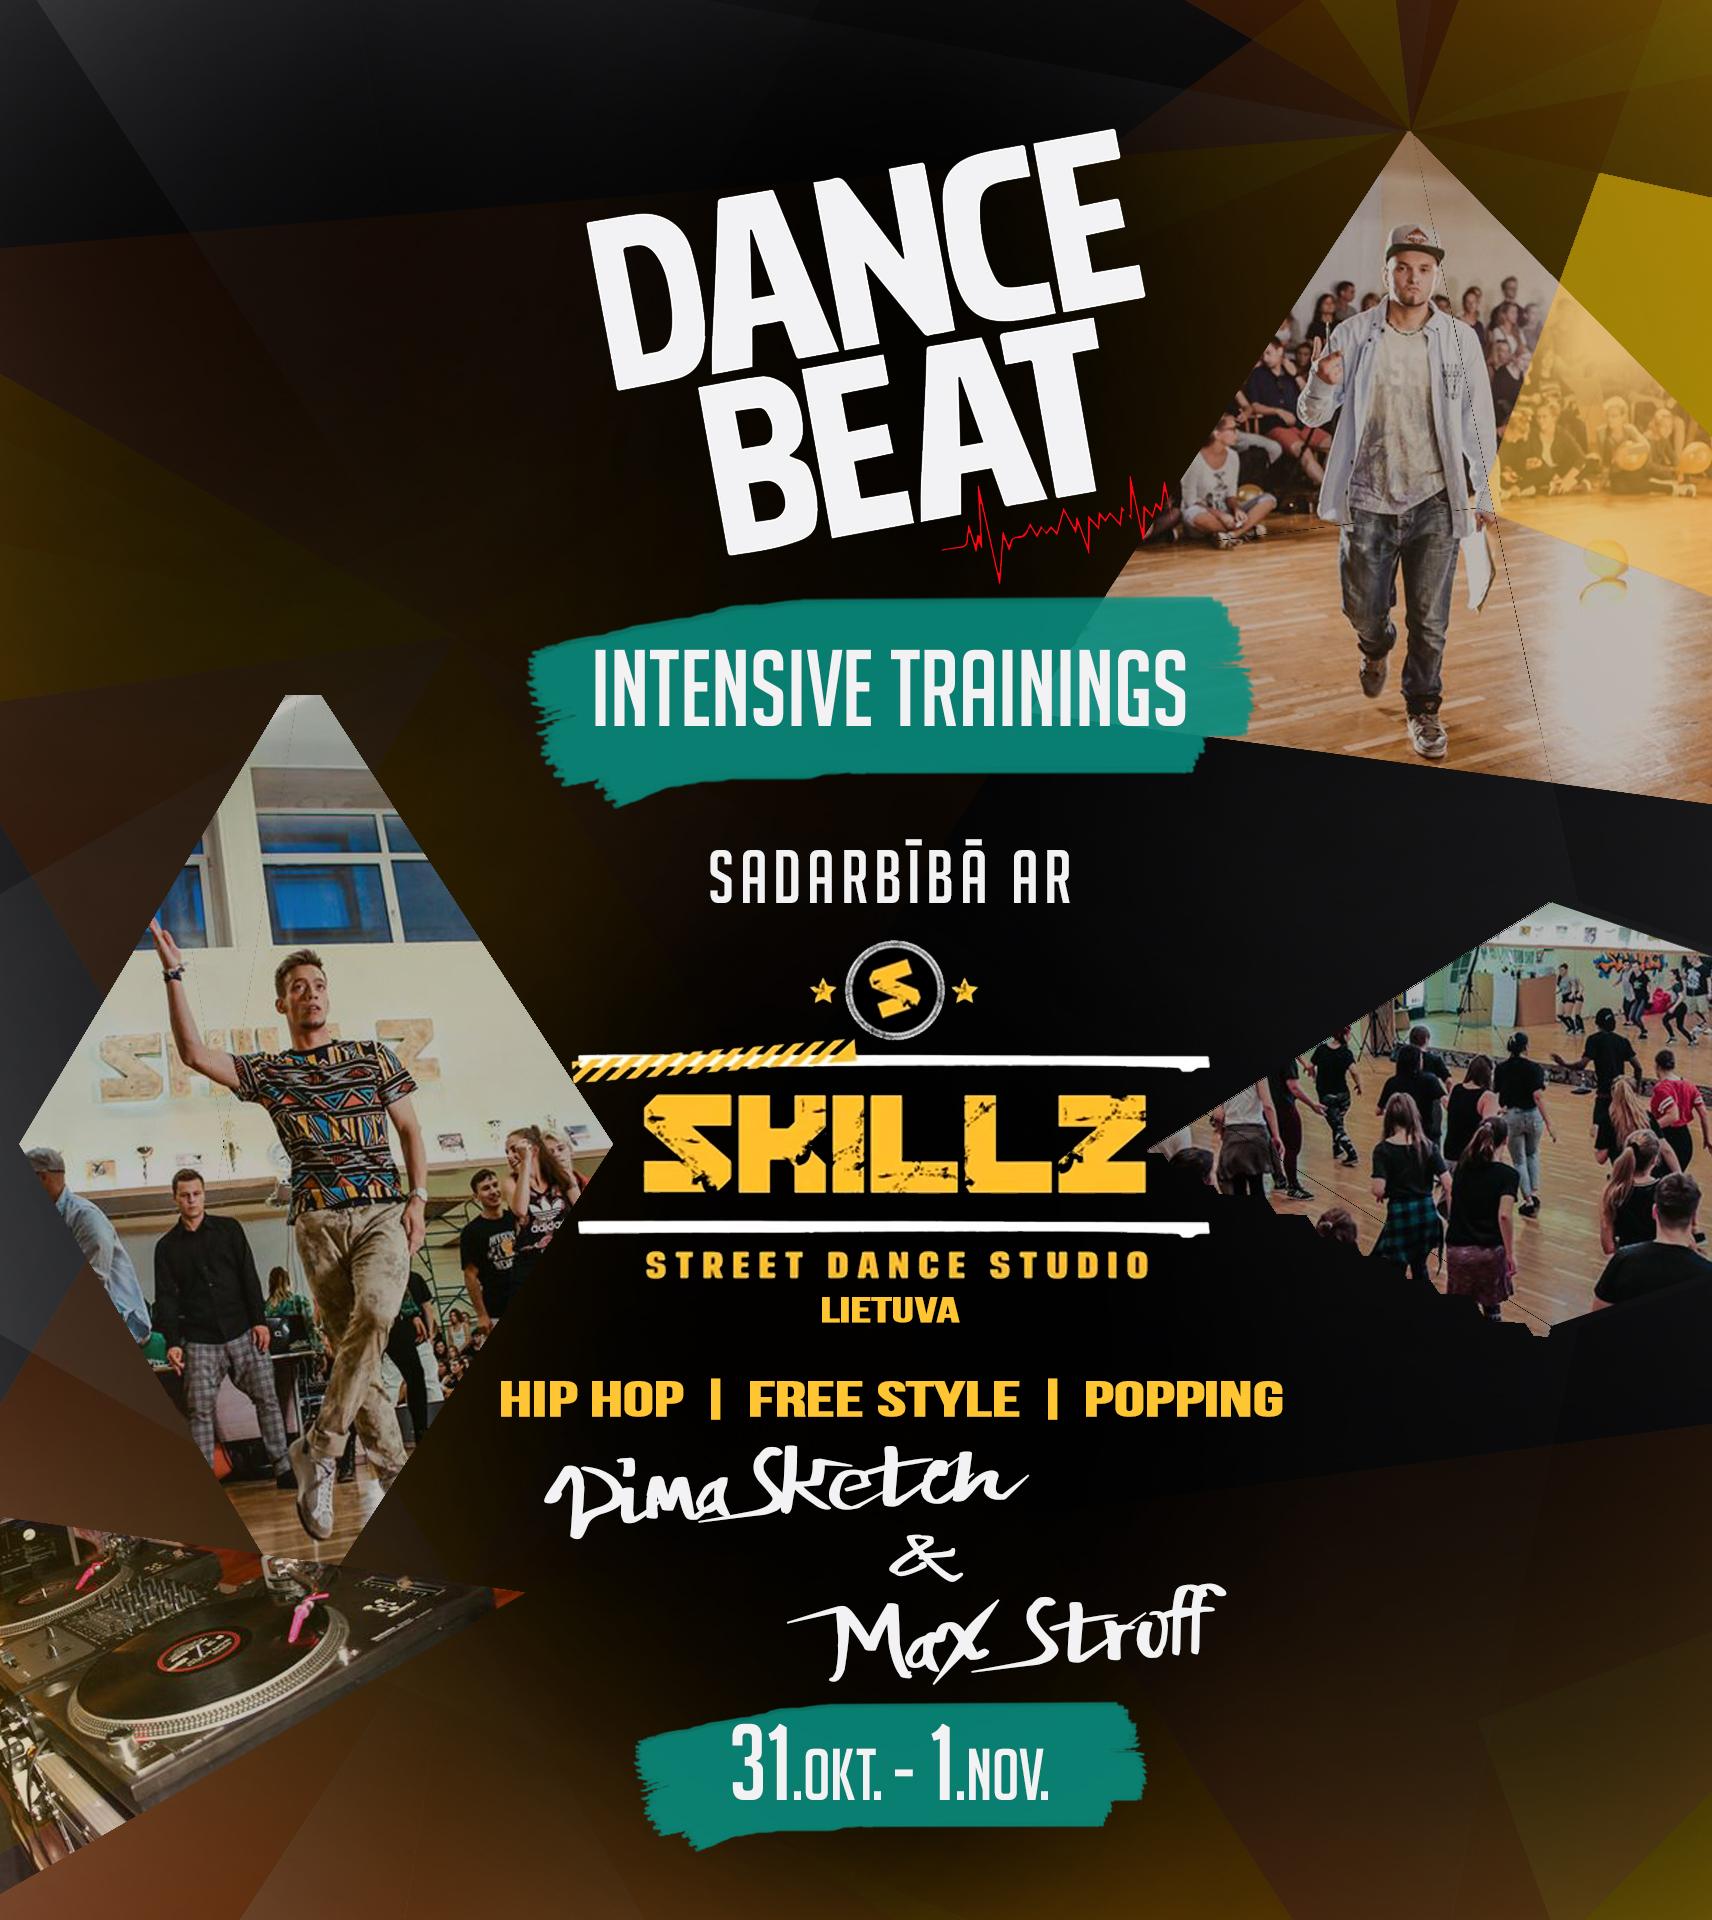 DanceBeat_Lietuva_2015